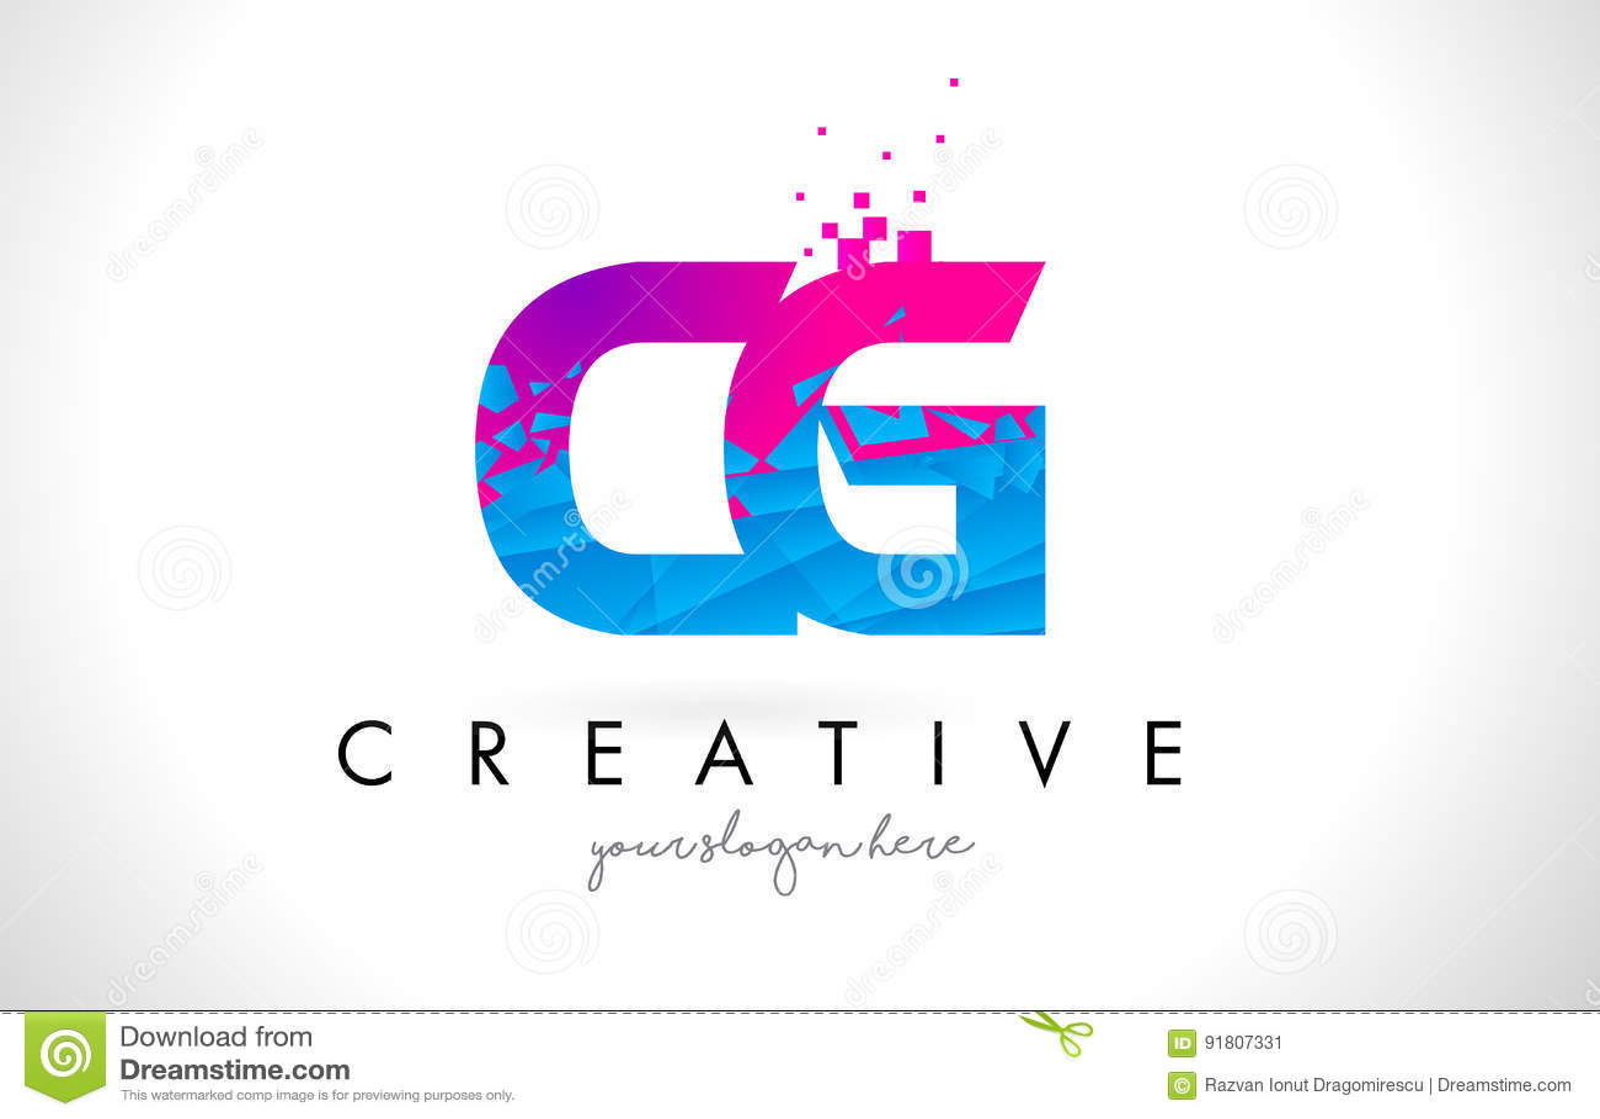 CG C G Letter Logo with Shattered Broken Blue Pink Texture Design Vector.